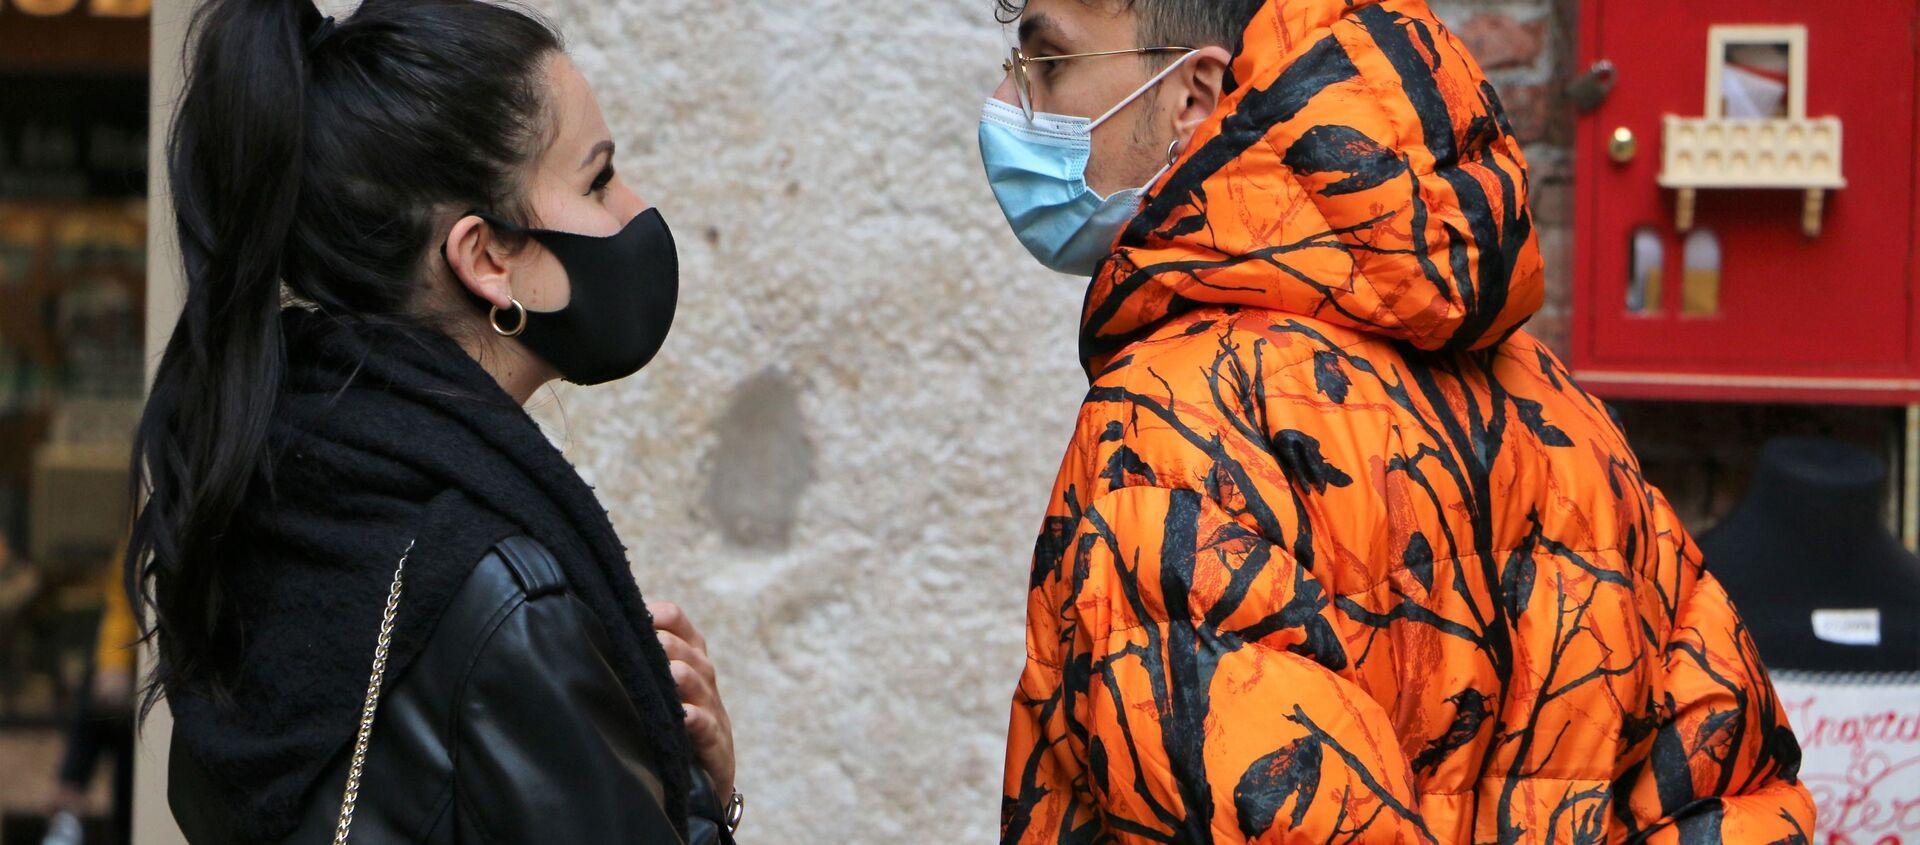 Persone in mascherina in Italia - Sputnik Italia, 1920, 05.05.2021